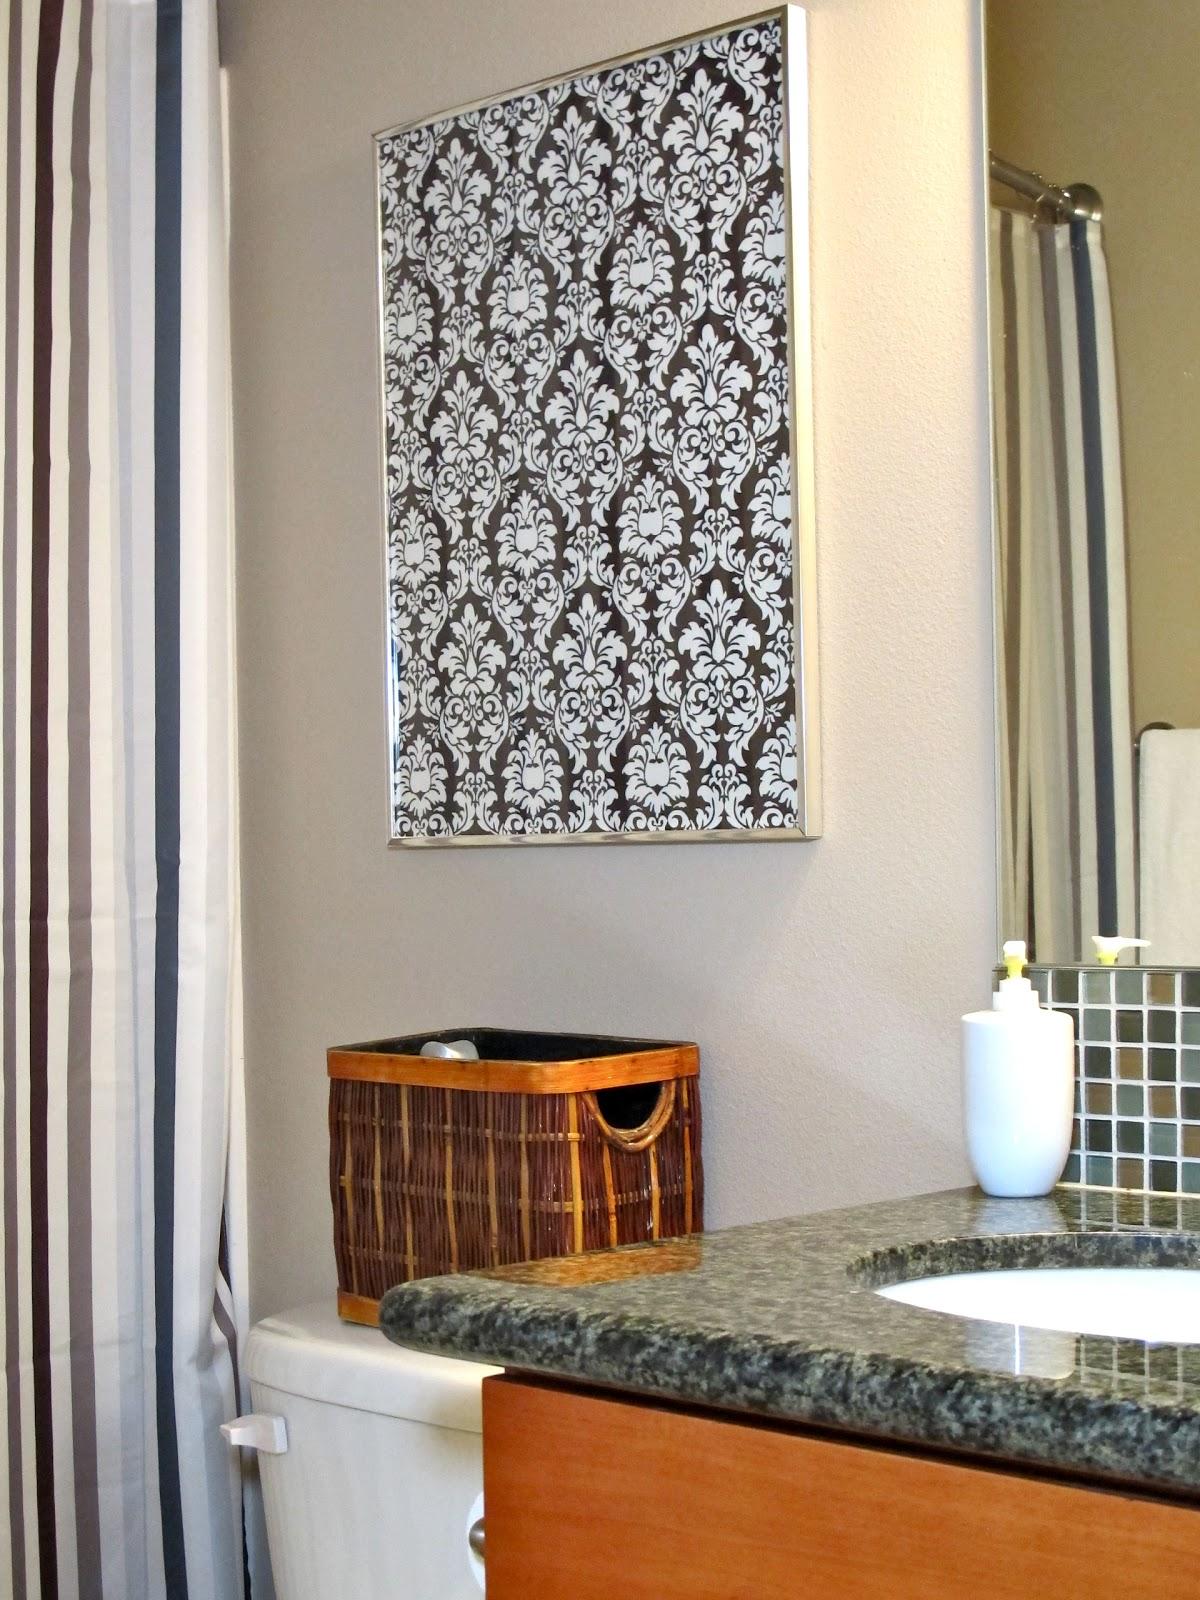 Blukatkraft diy quick easy wall art for bathroom - Bathroom wall decor ideas ...